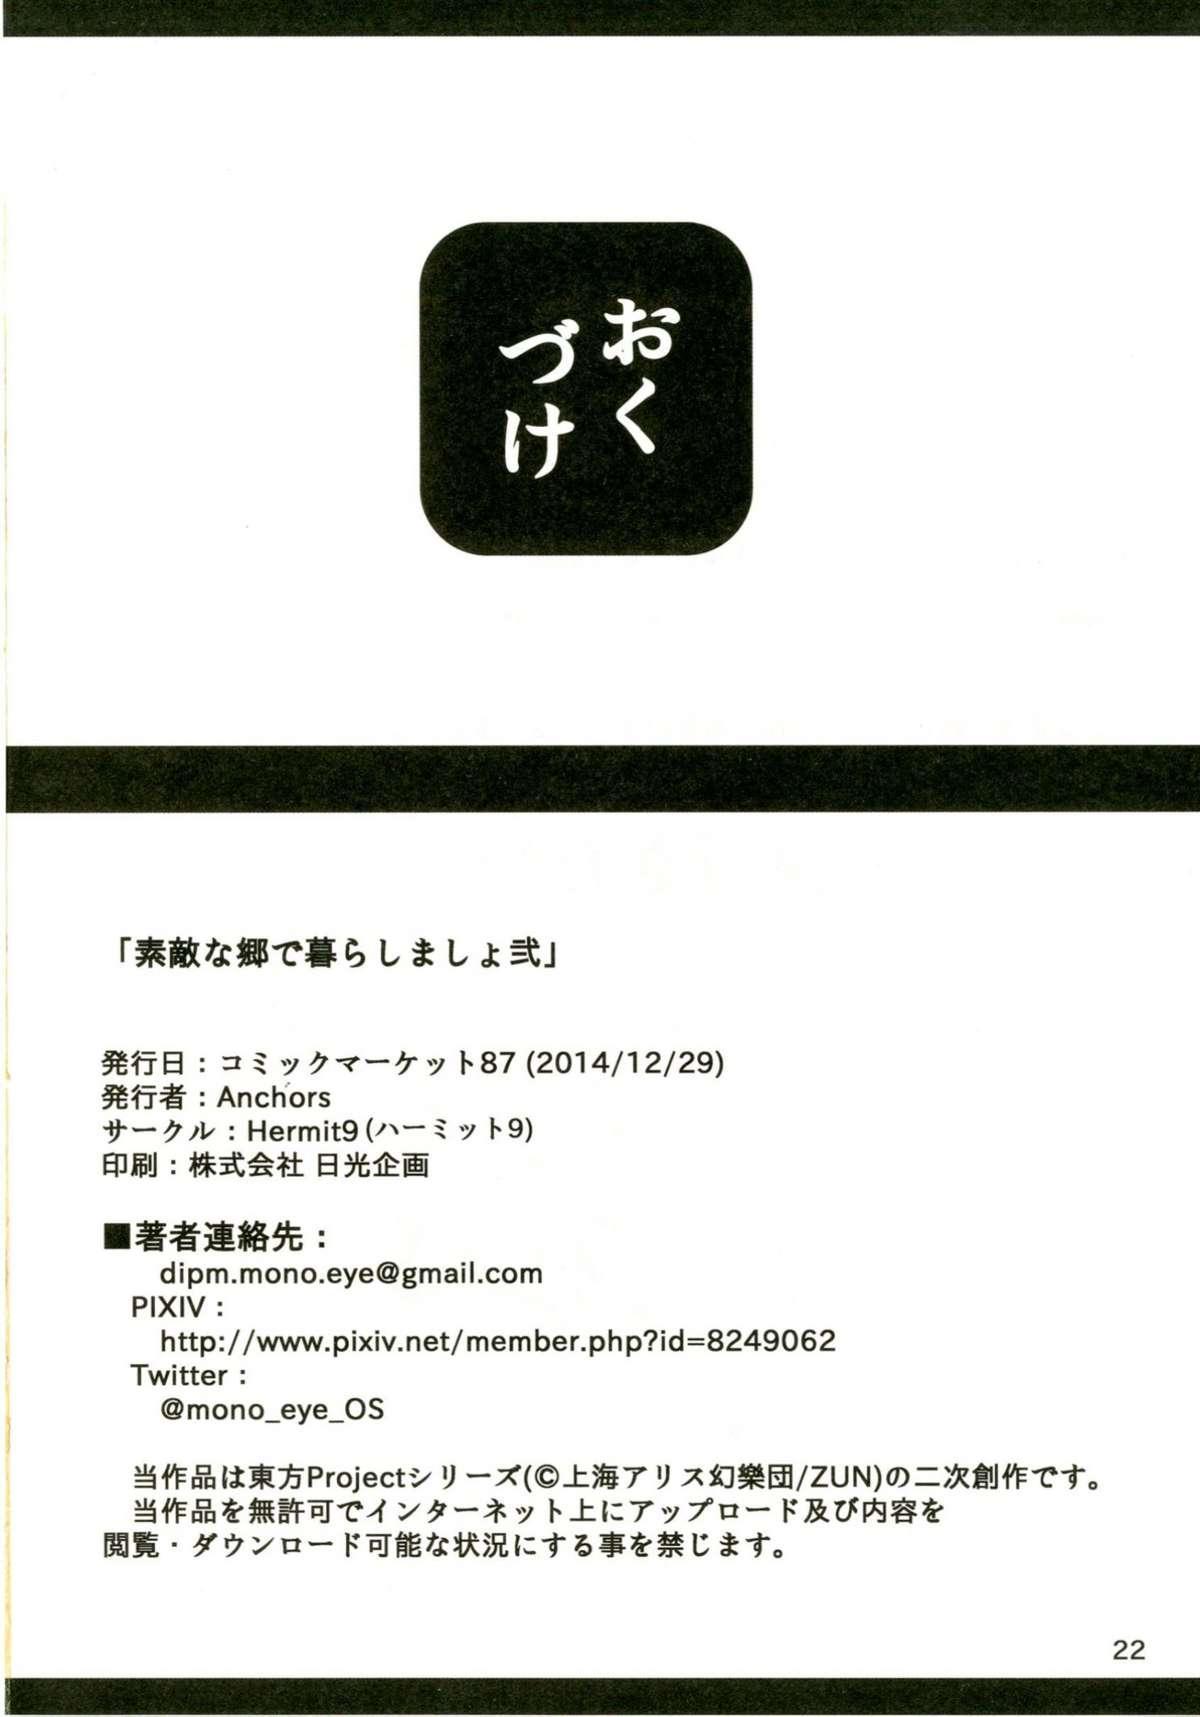 Suteki na Sato de Kurashimasho Ni   Let's Go Live in a Wonderful Village 2 21